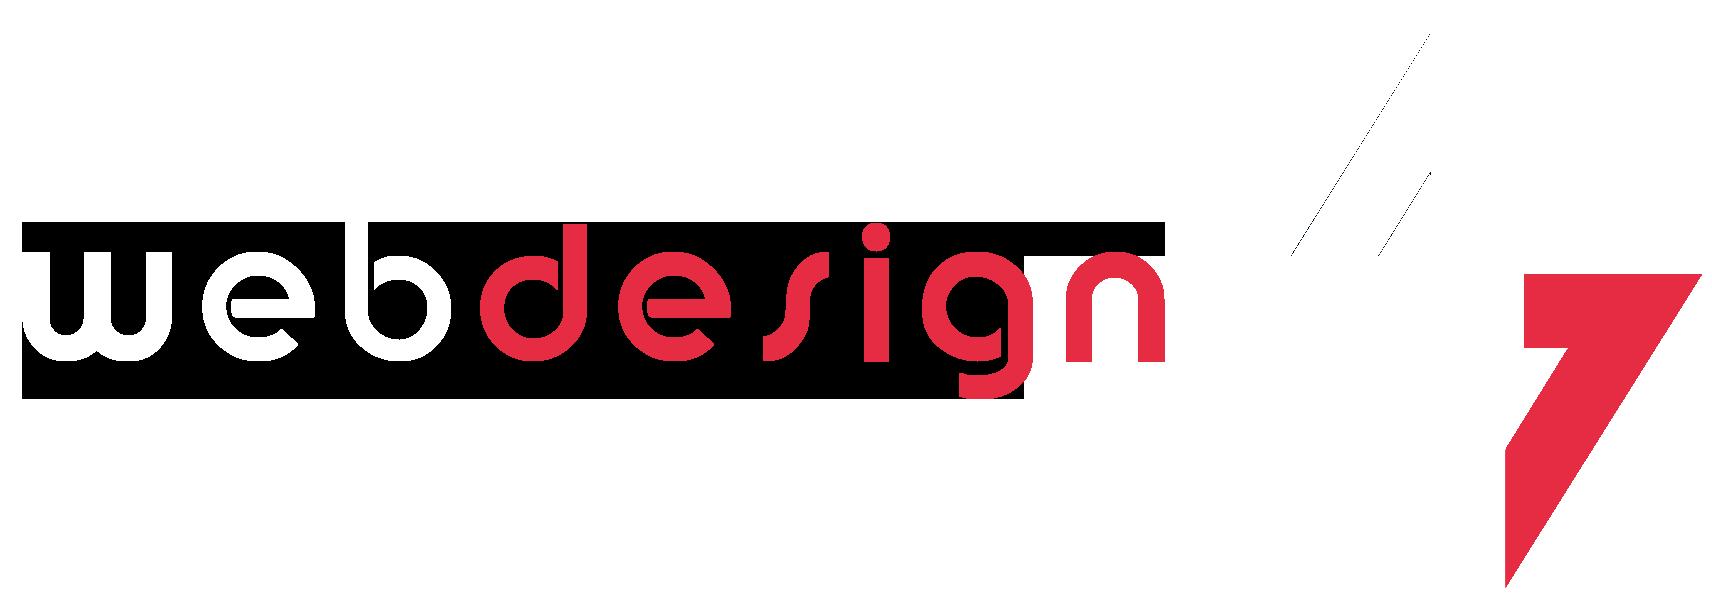 Logo de Webdesign 47